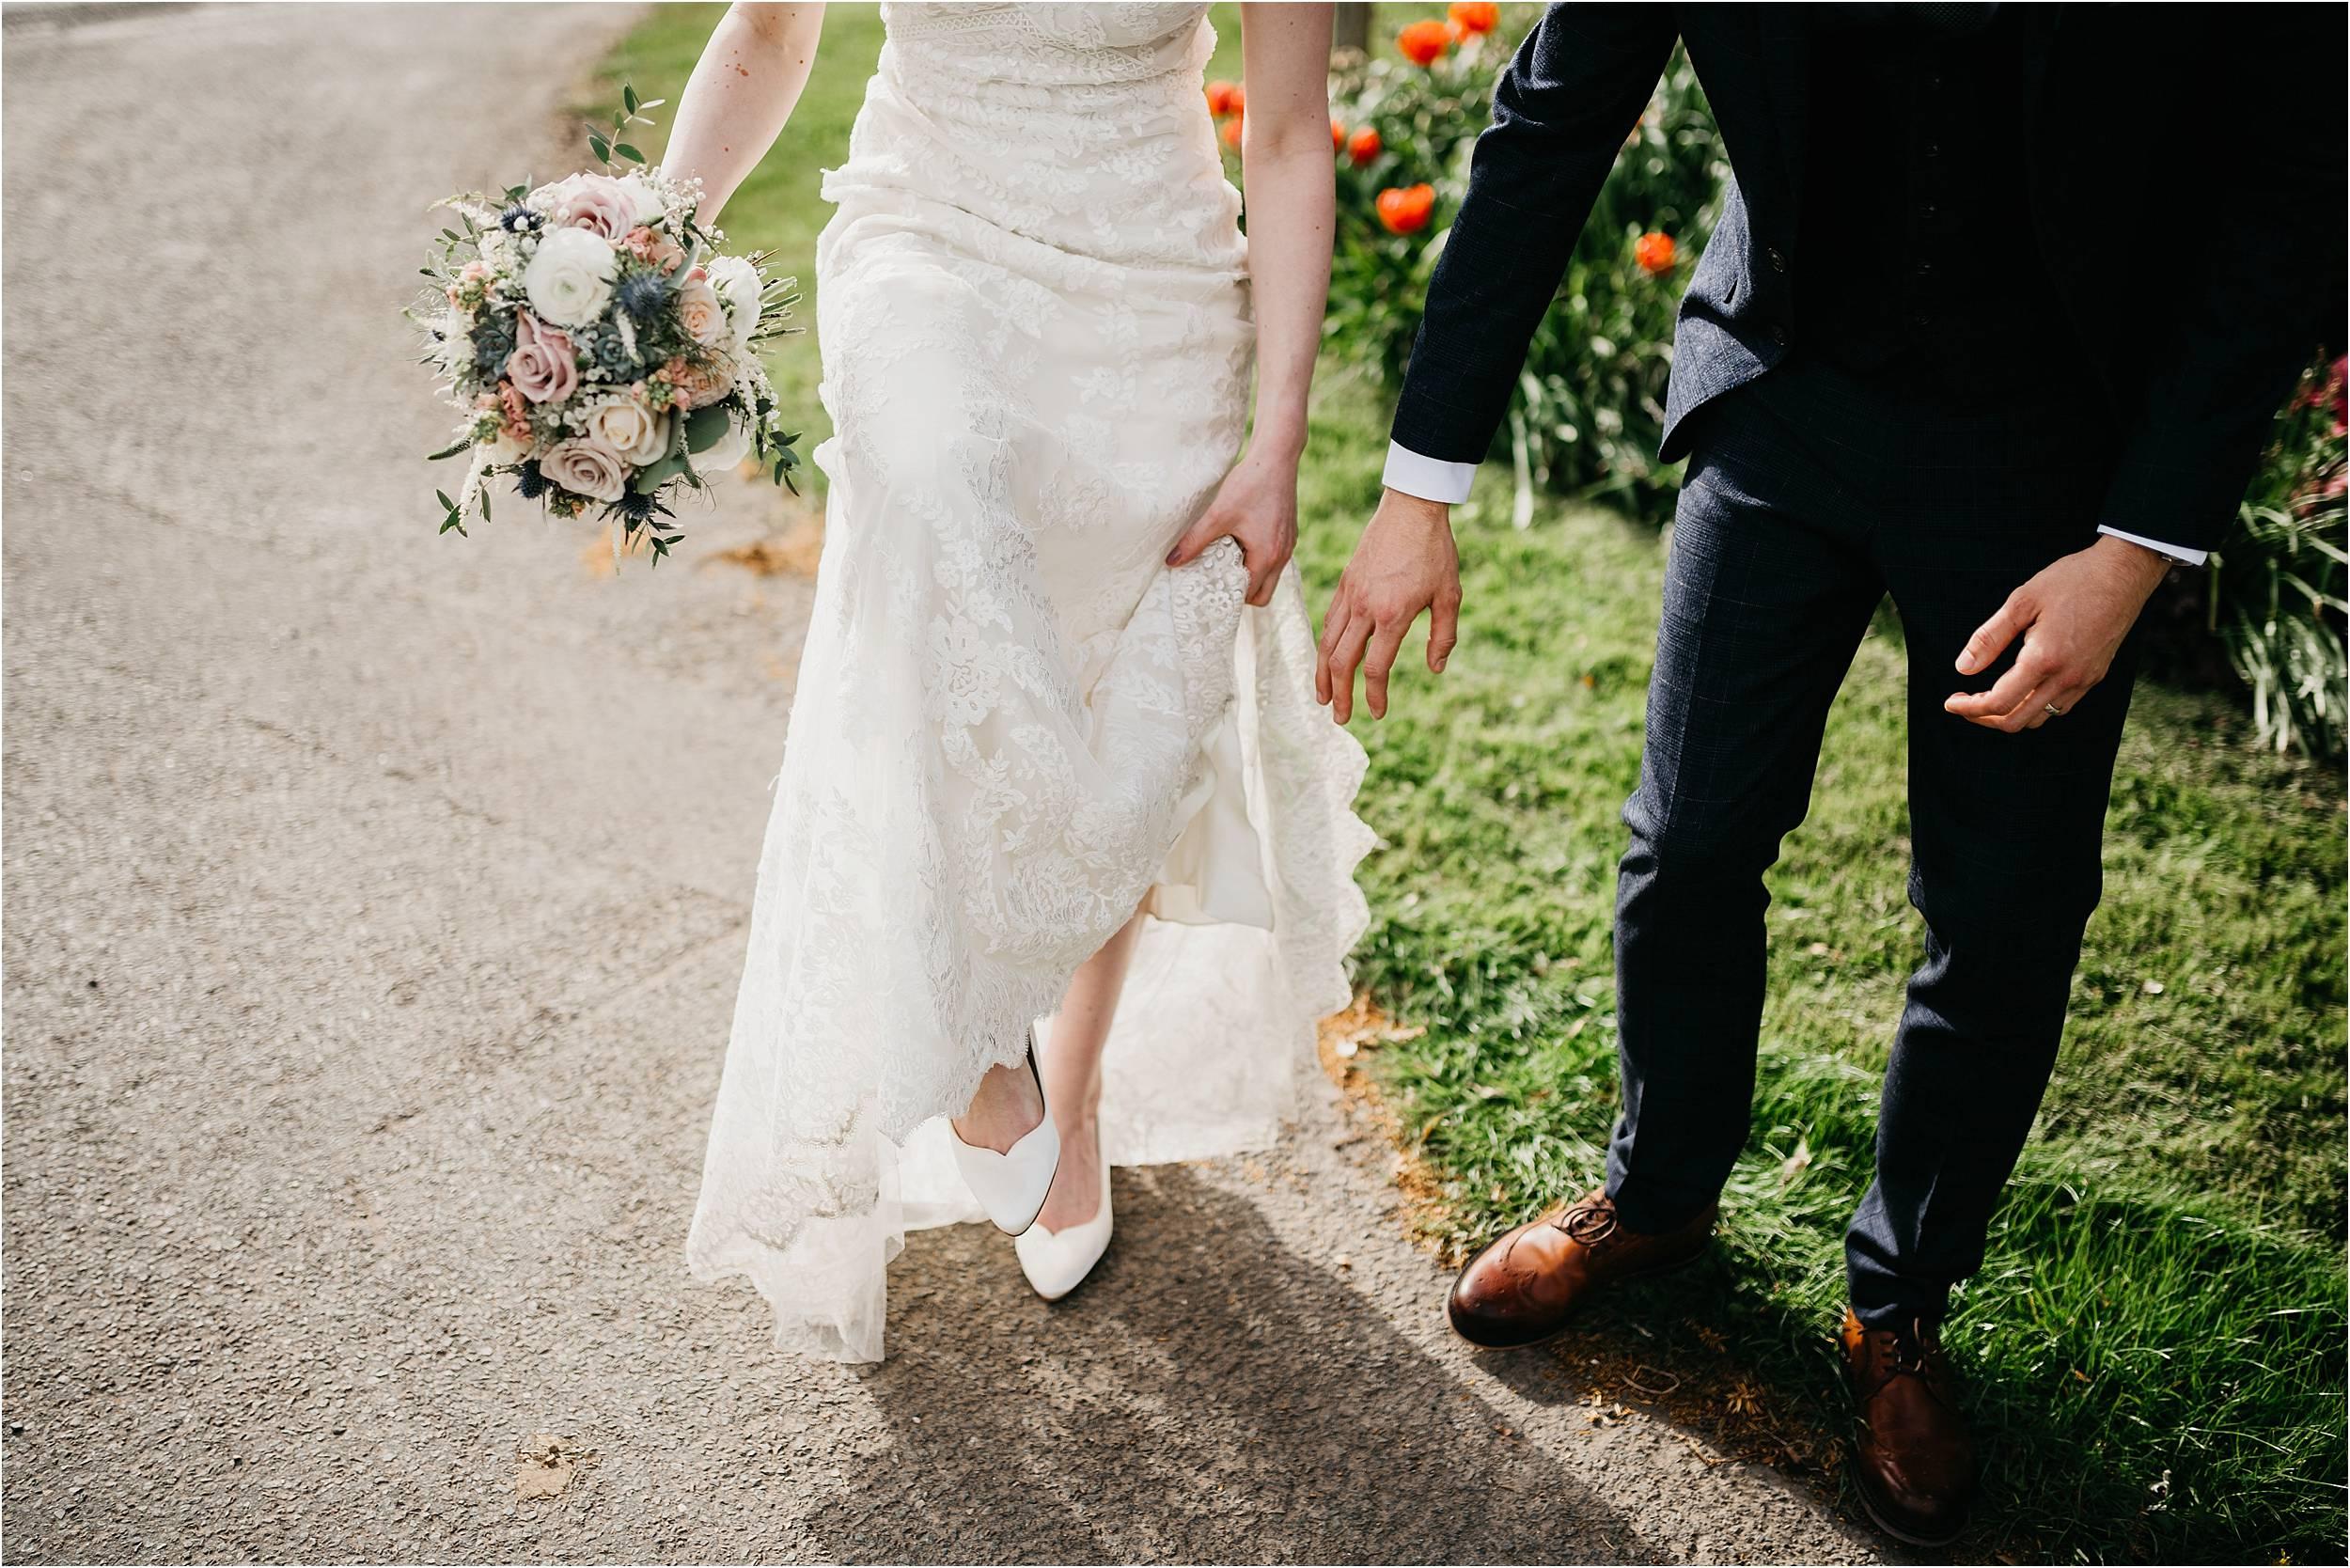 Kedleston Country House Wedding Photography_0077.jpg